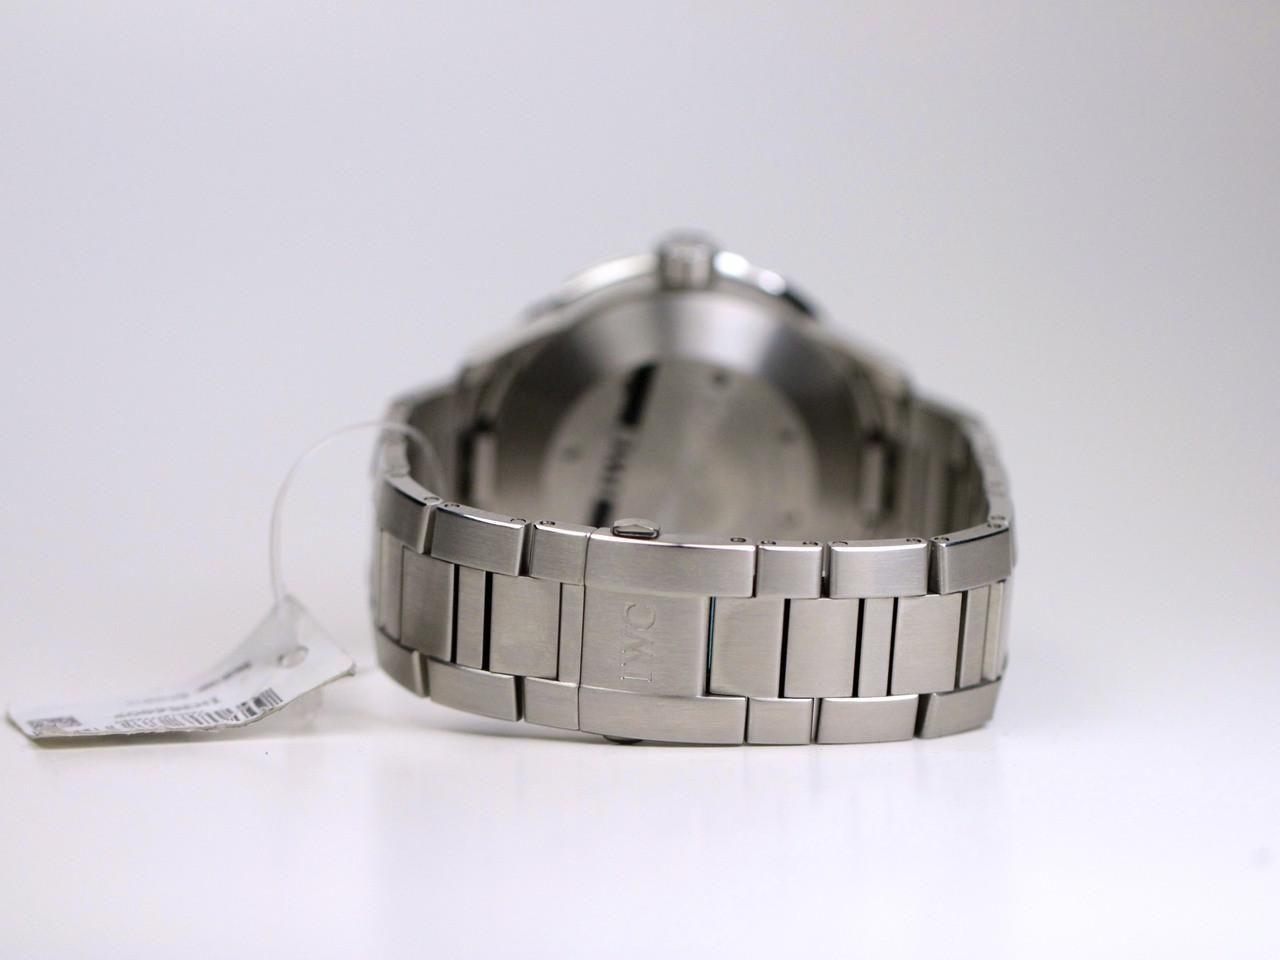 Clasp - IWC Watch - Aquatimer 2000 Automatic IW356809 - www.Legendoftime.com - Chicago Watch Center